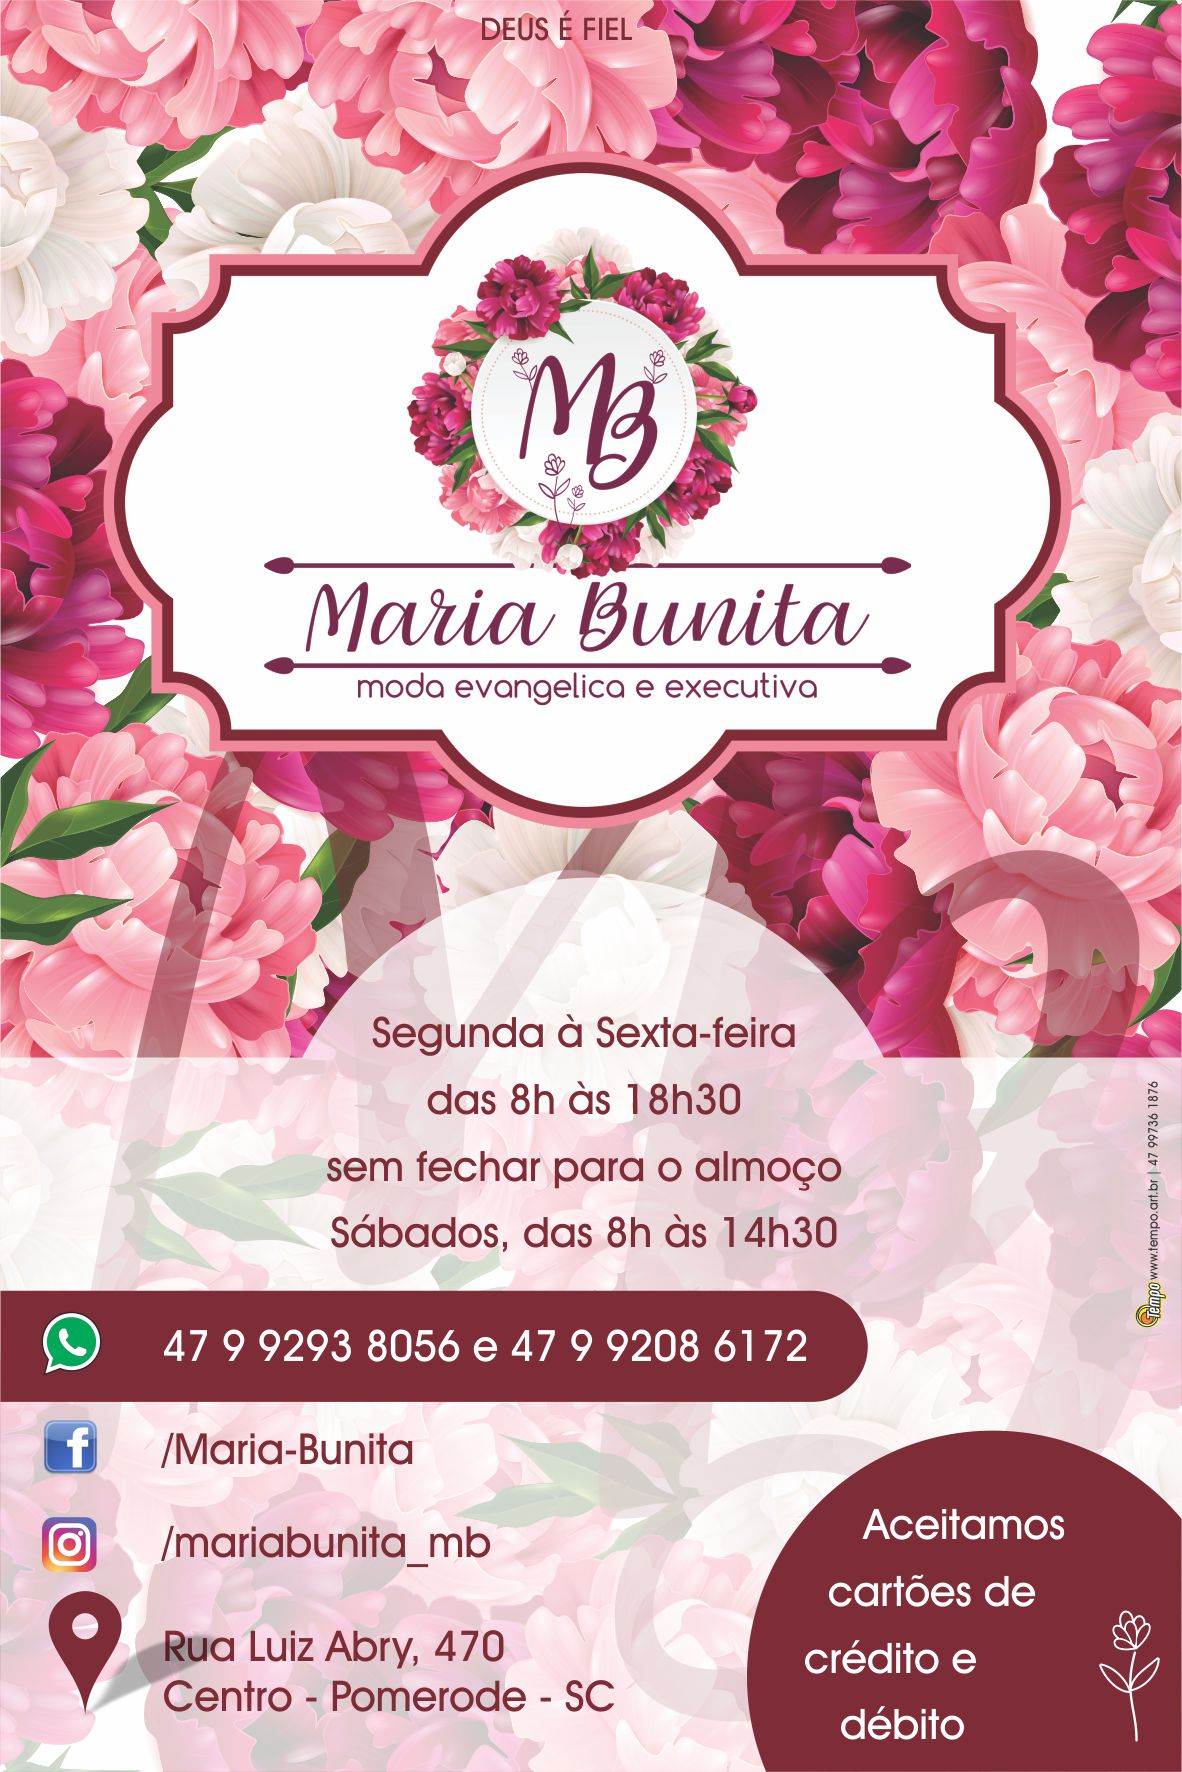 Maria Bunita Flyer 1